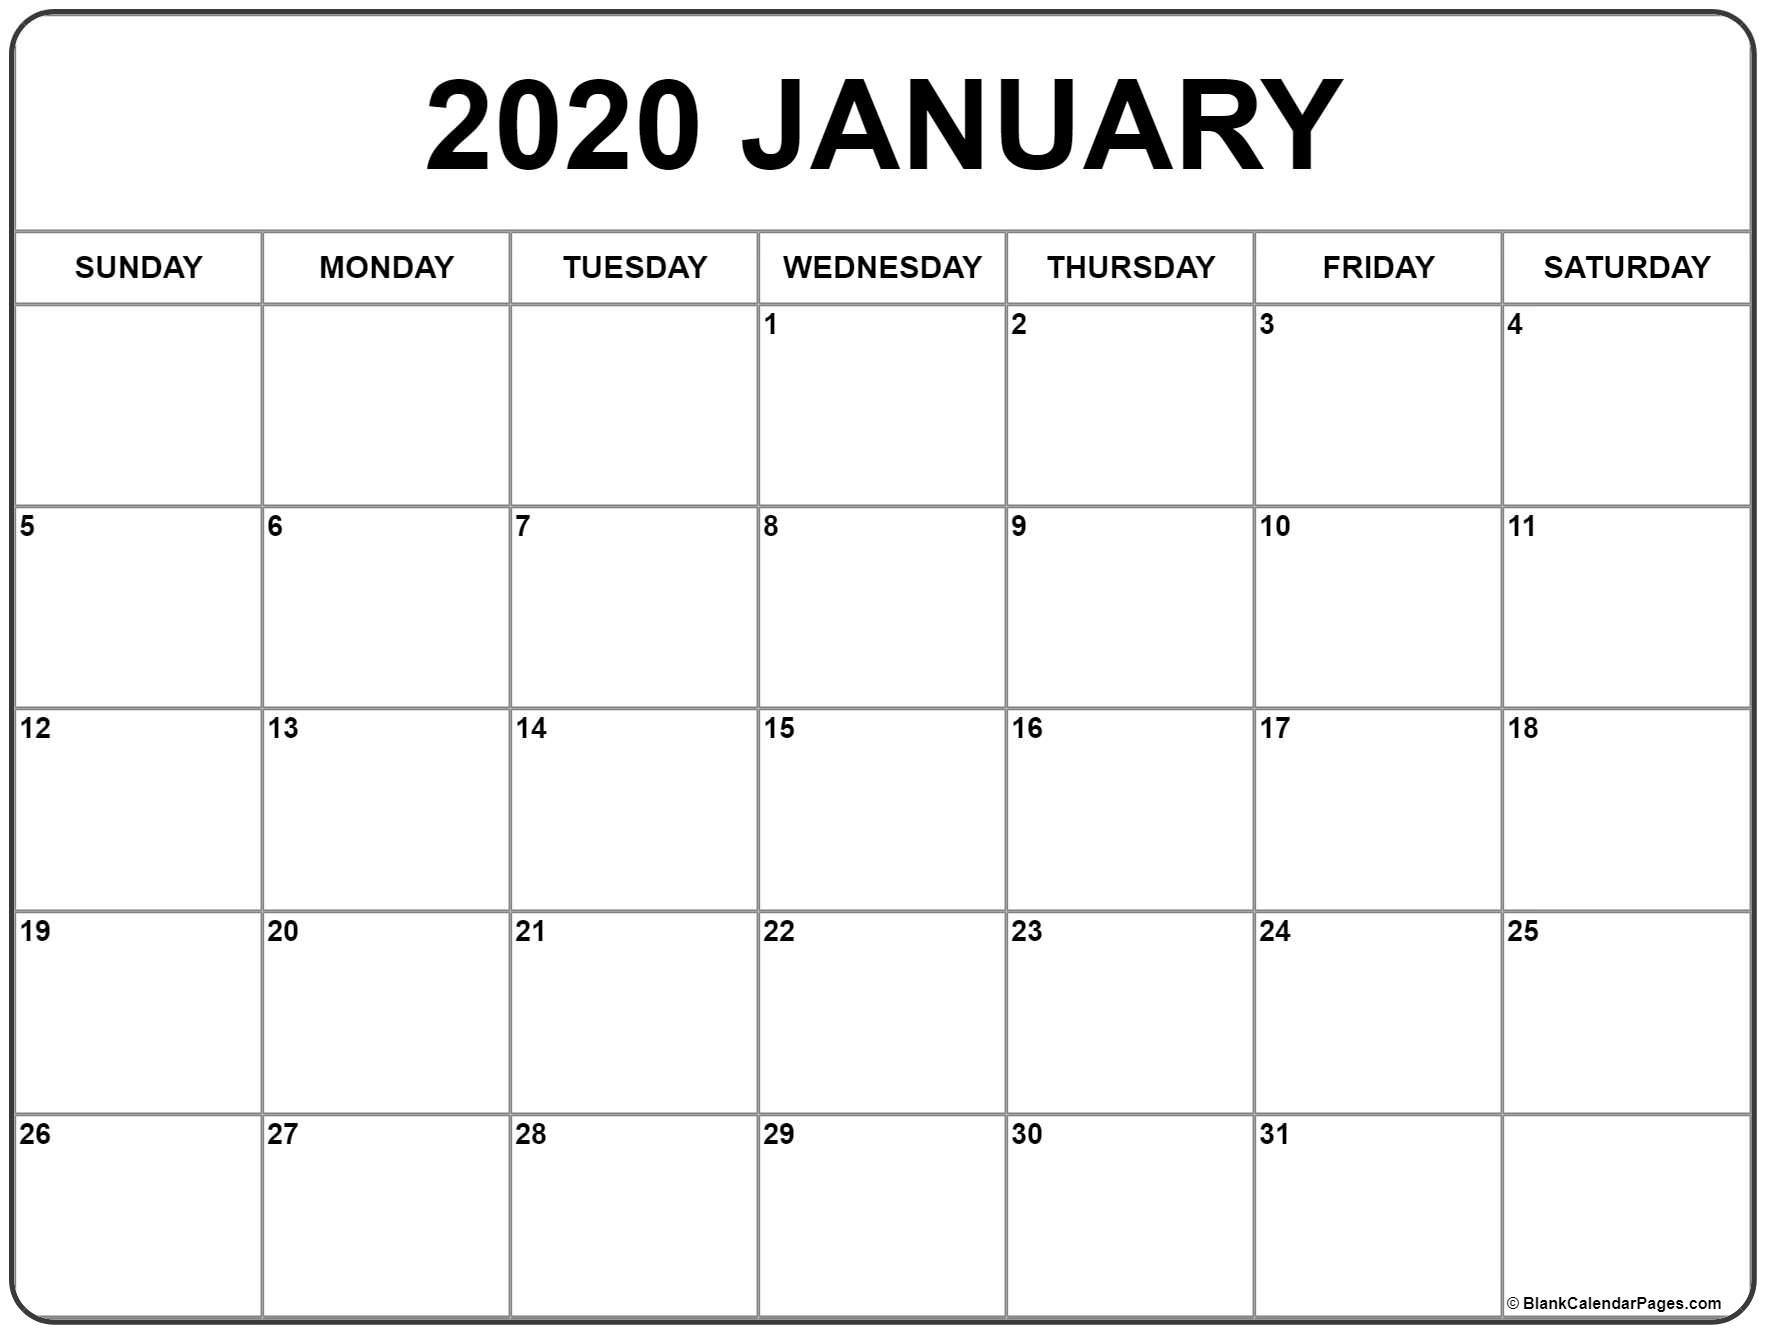 2020 Monthly Calendar Printable - Togo.wpart.co